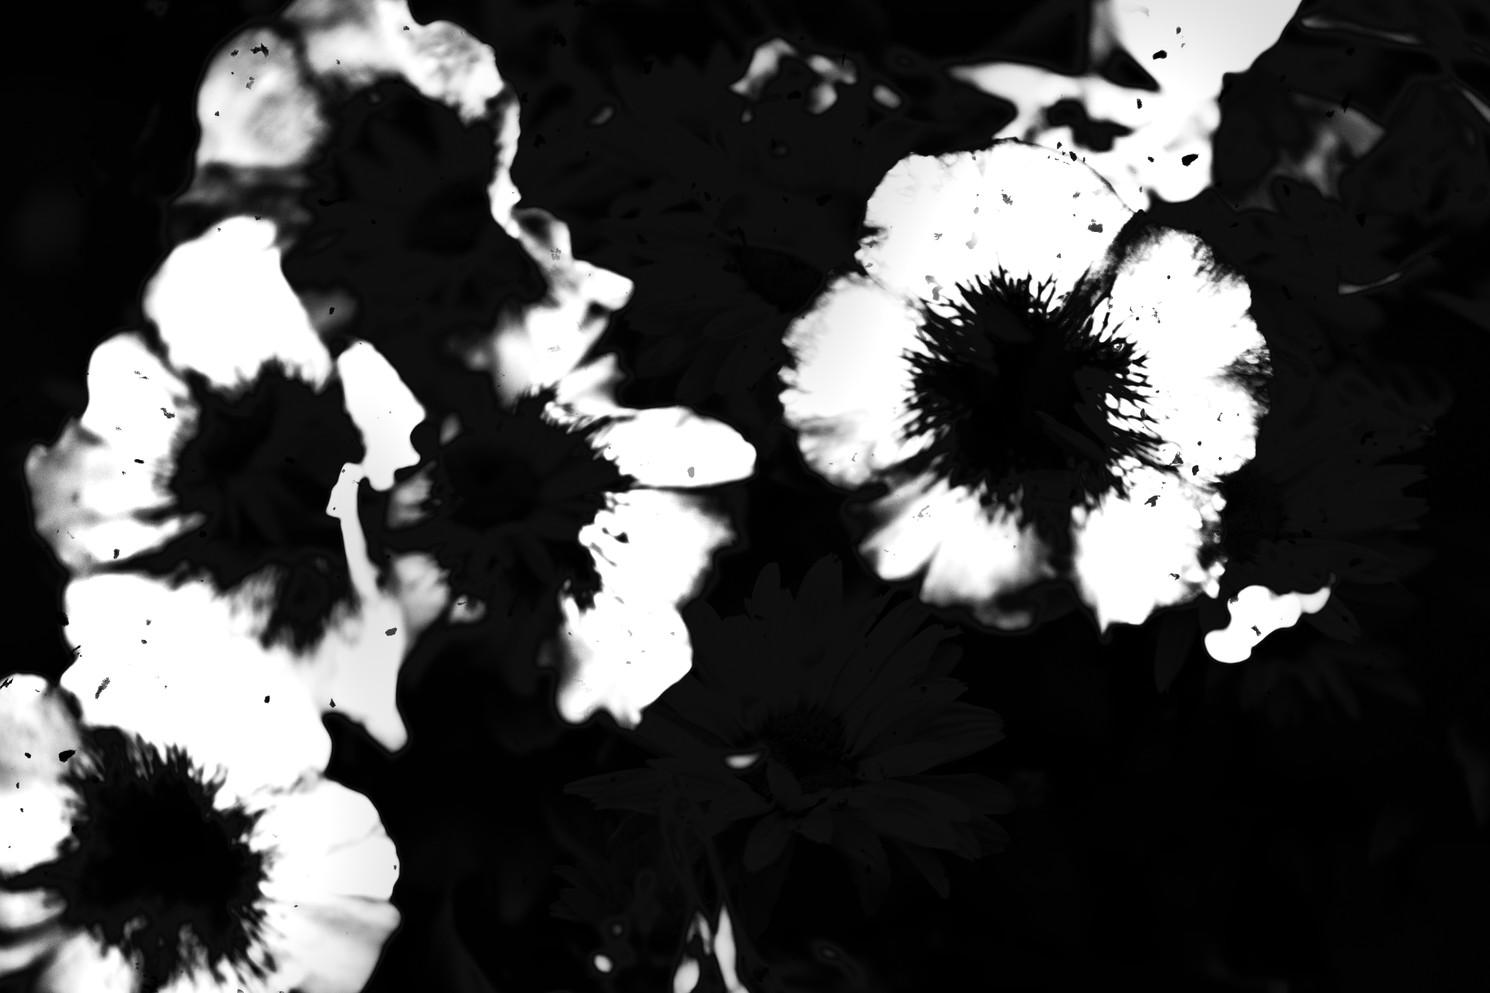 The Garden of Persephone 006